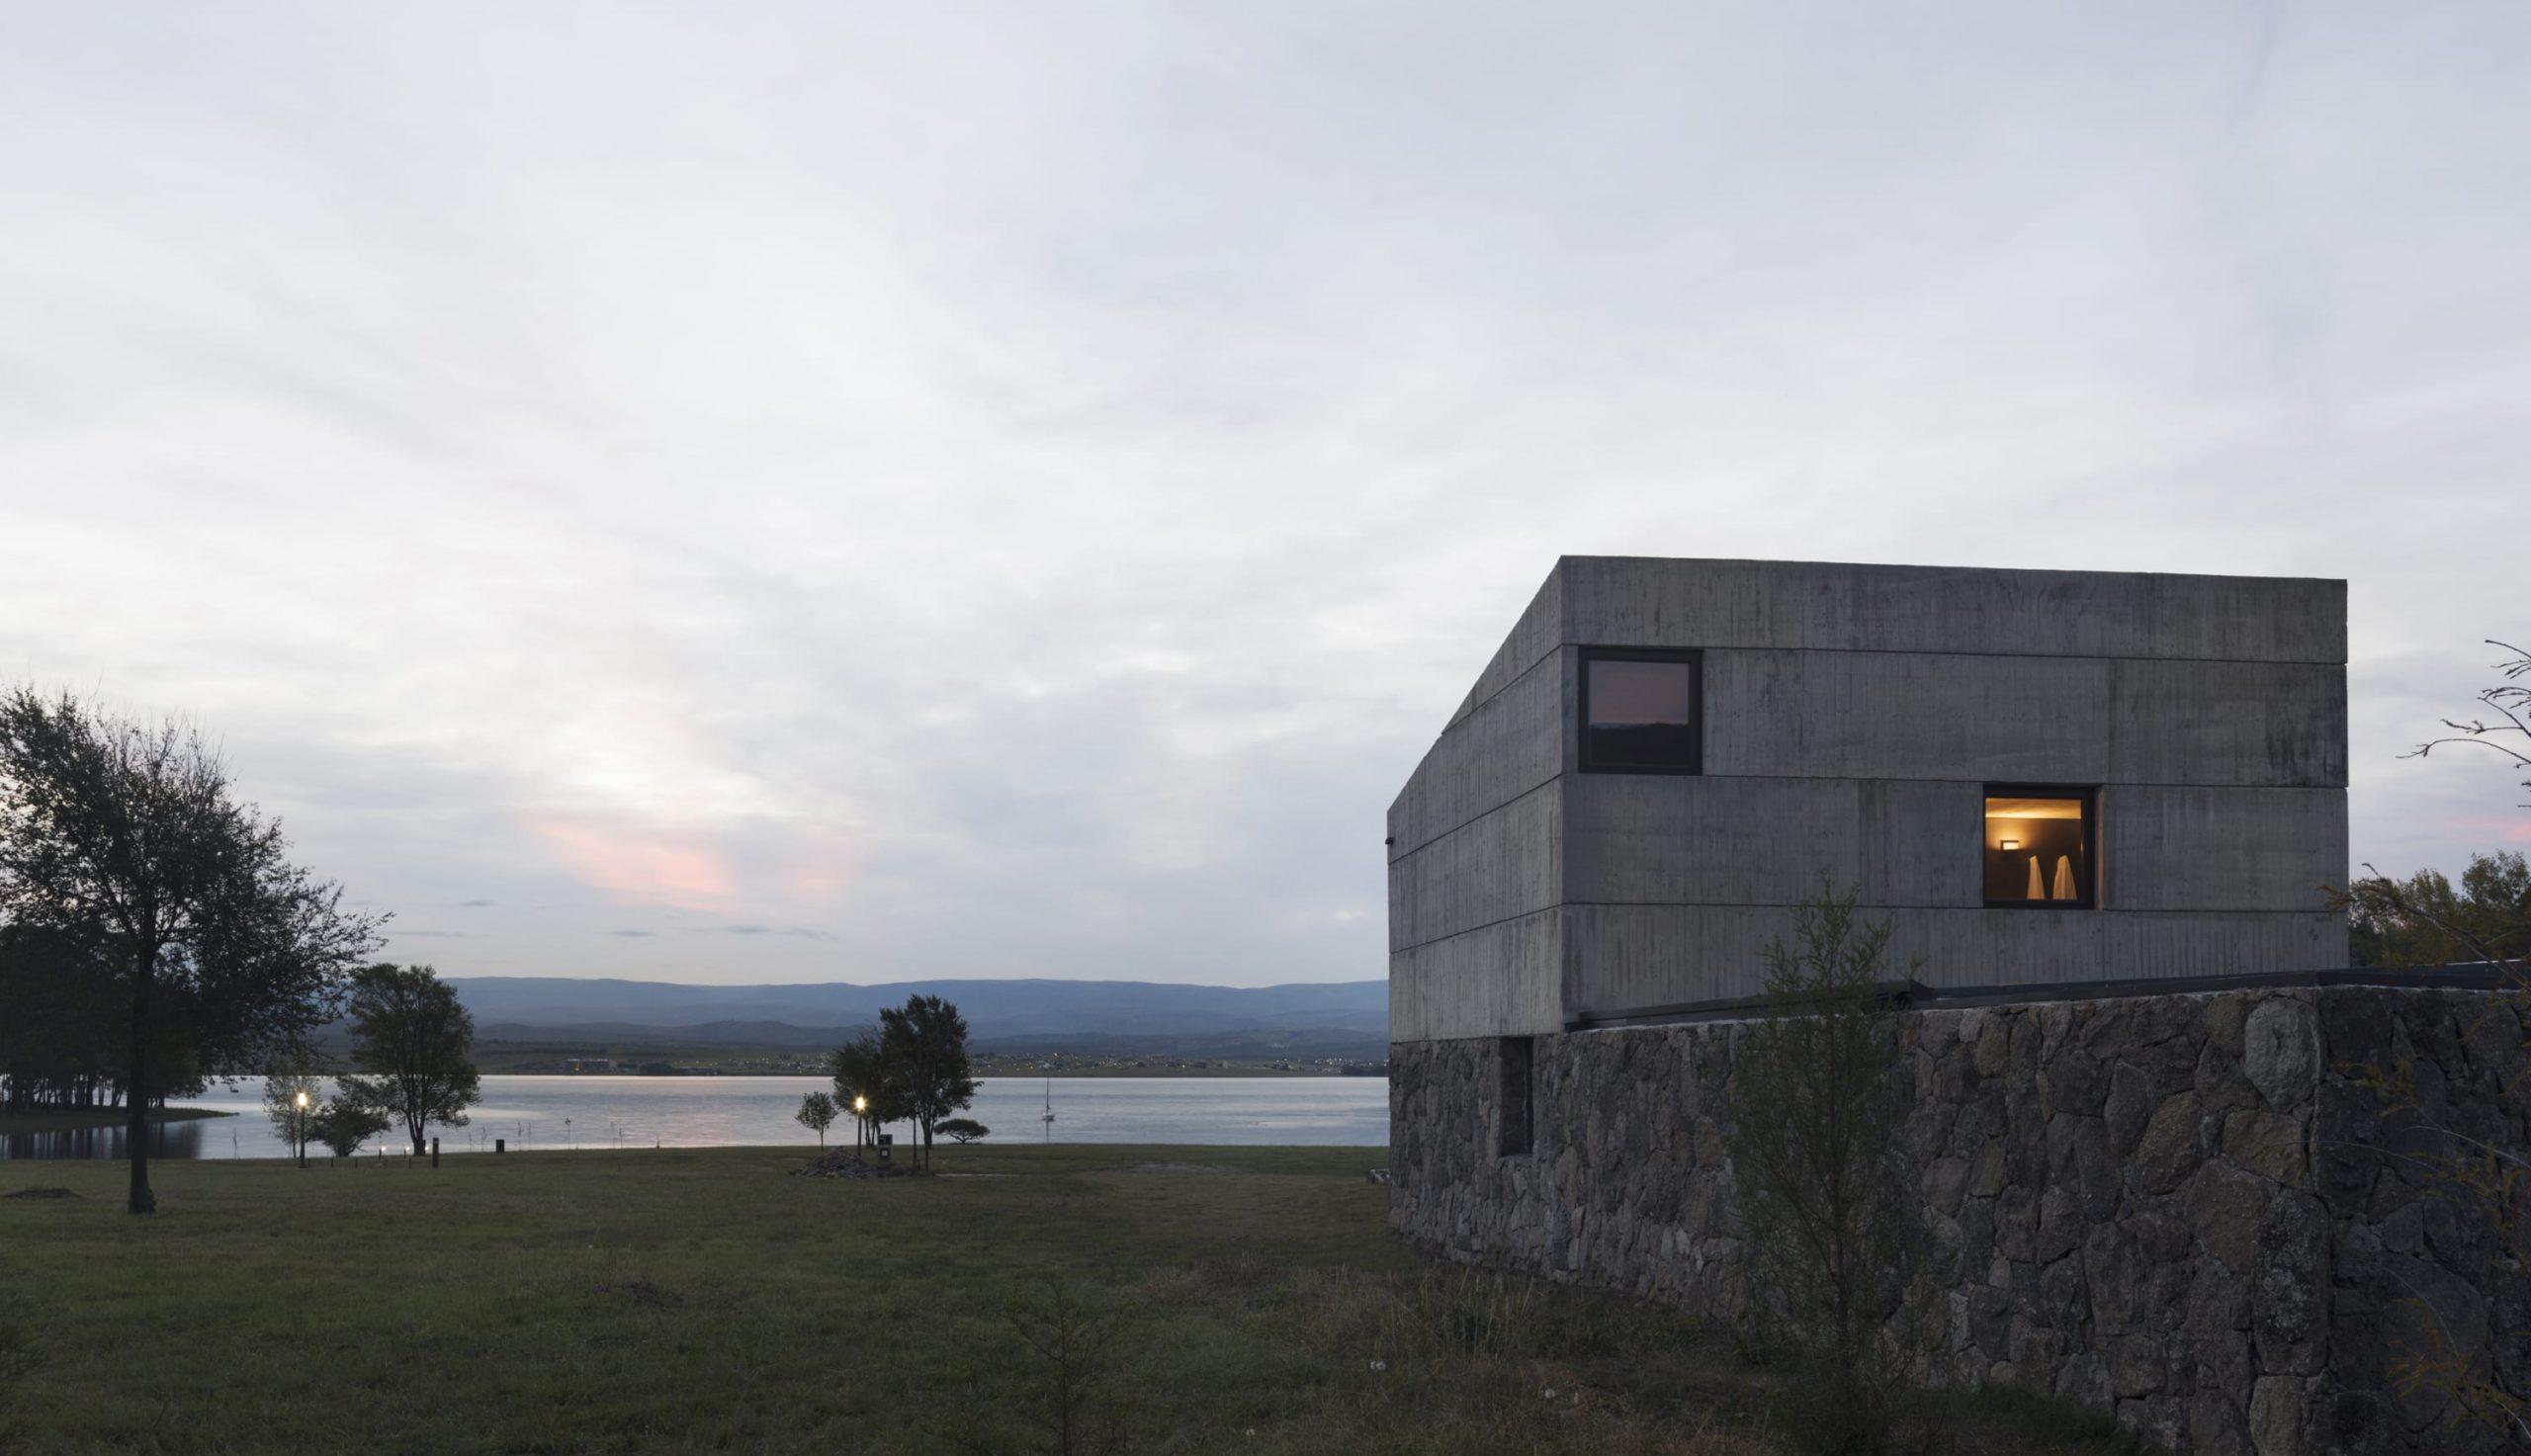 vistas al lago de la casa alarcia fotografiada por  Federico Cairoli